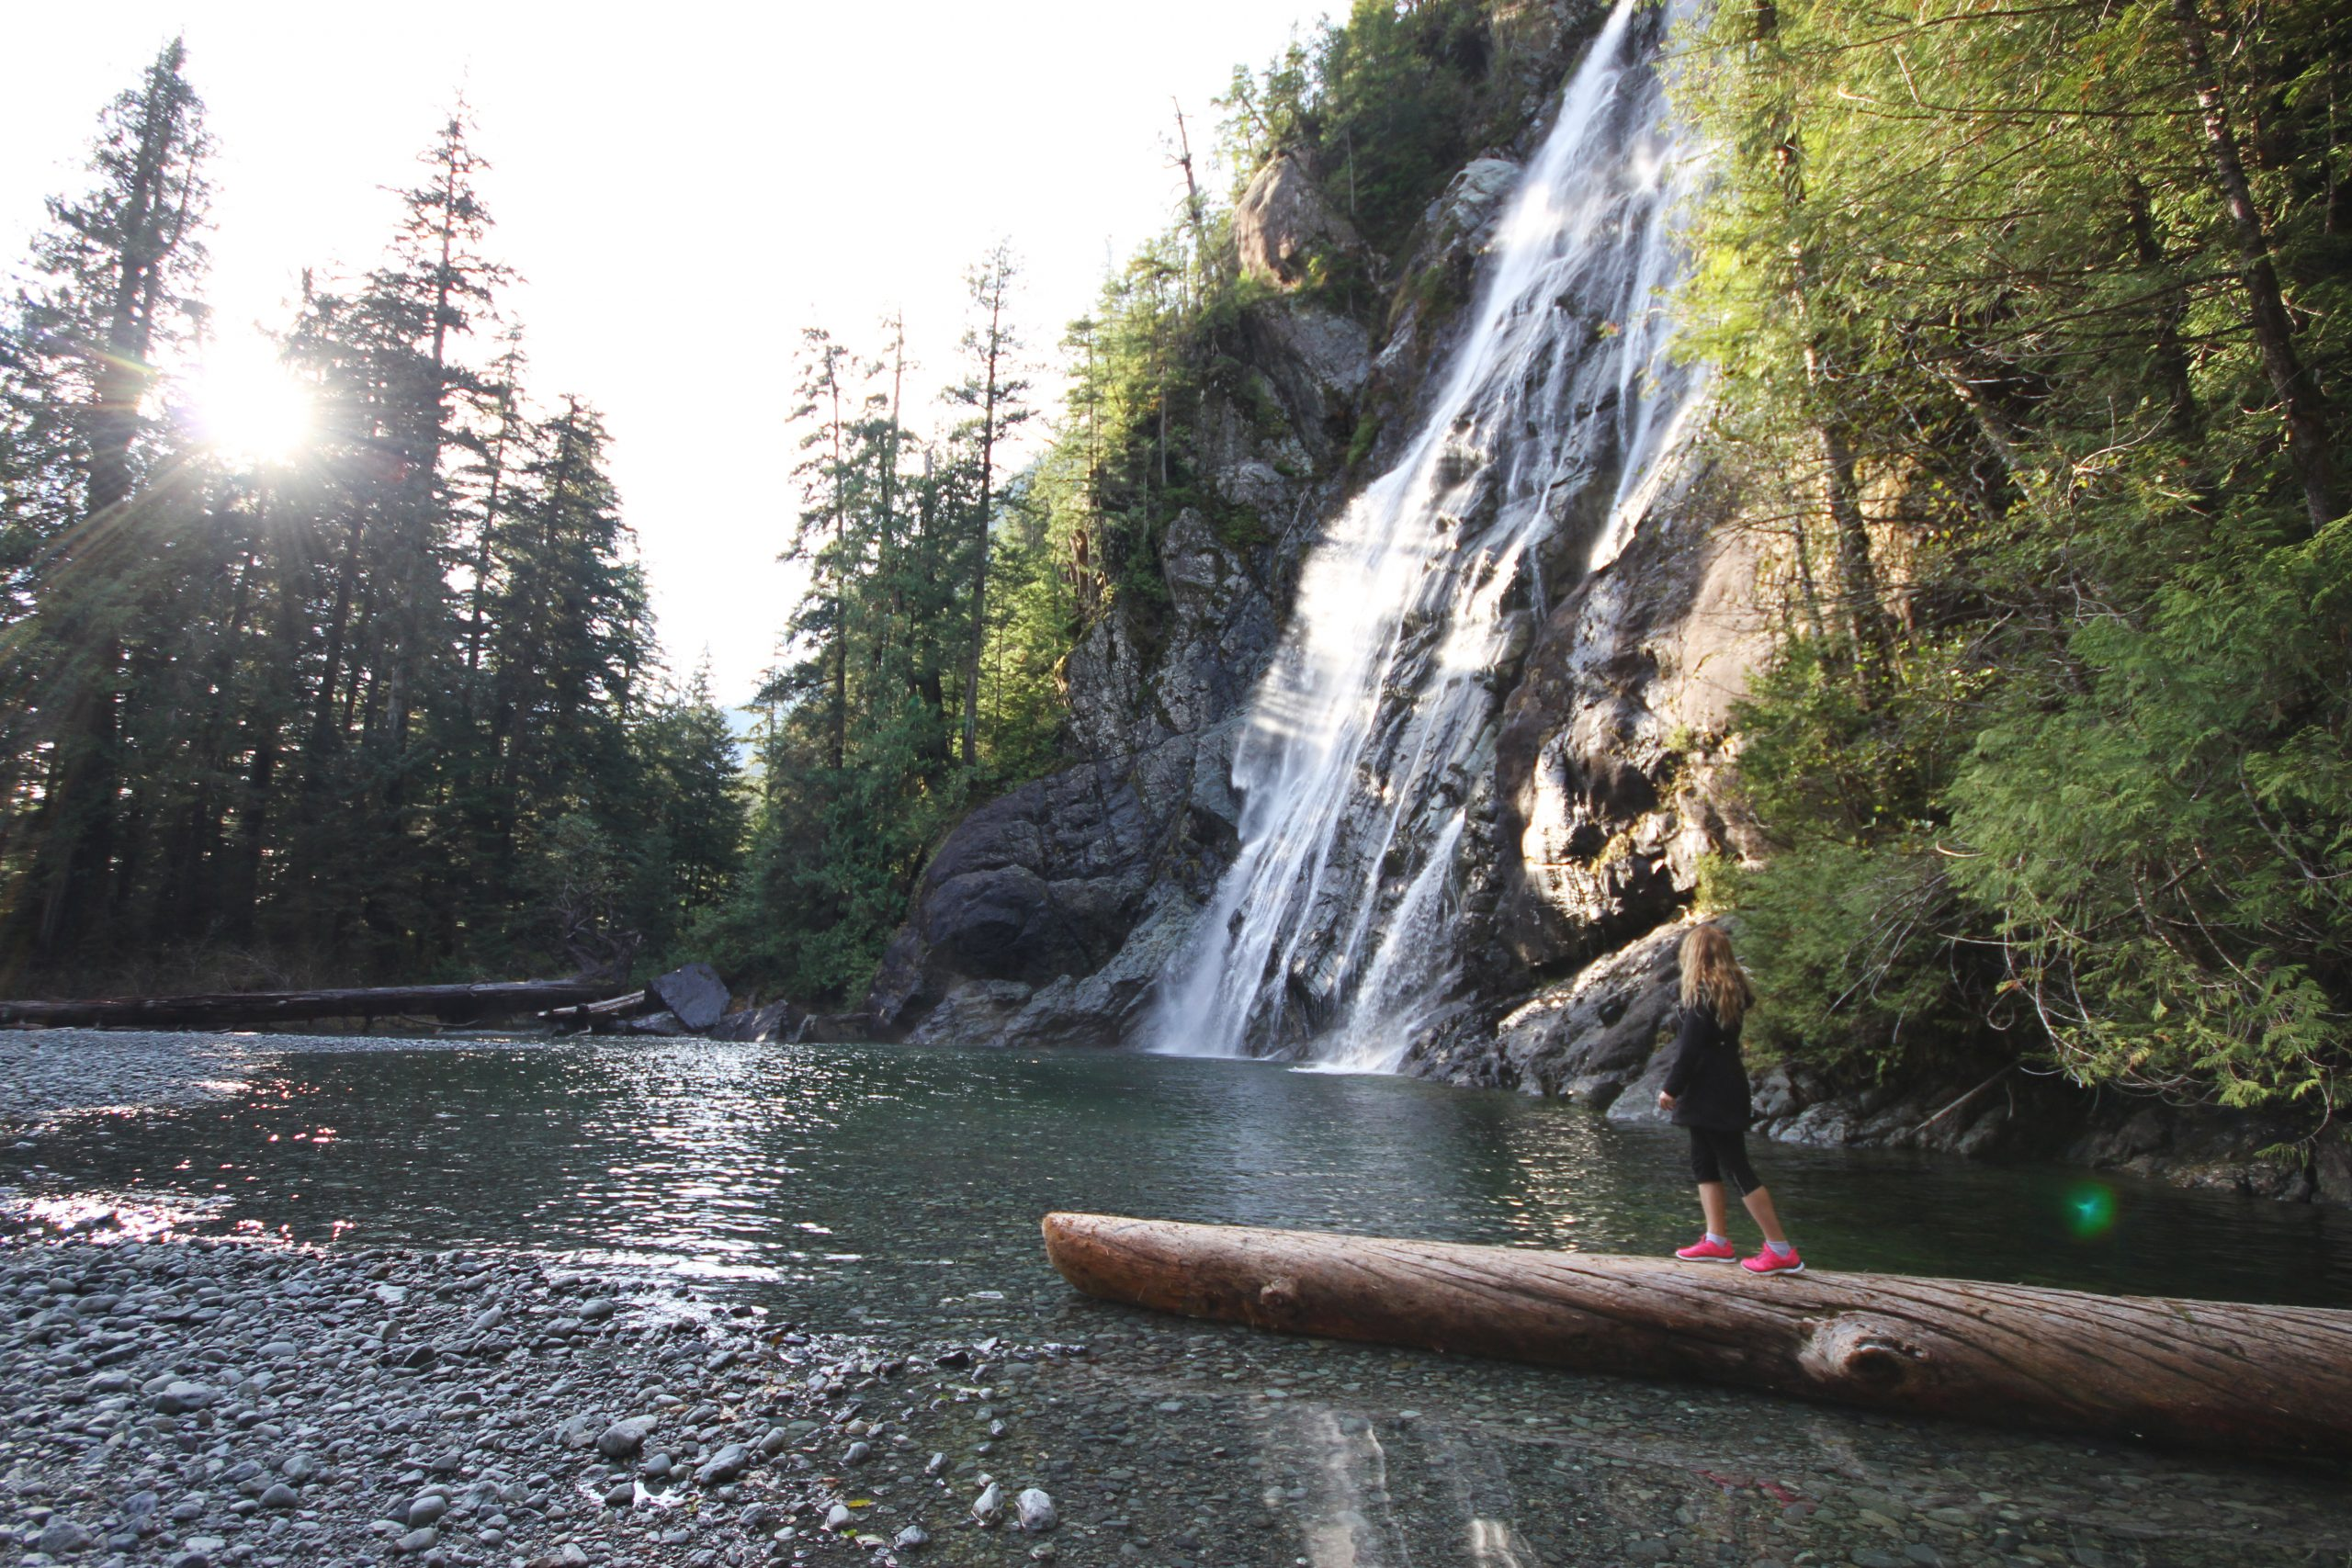 Tofino Elopement Photography | Tofino Elopement Locations | Virgin Falls